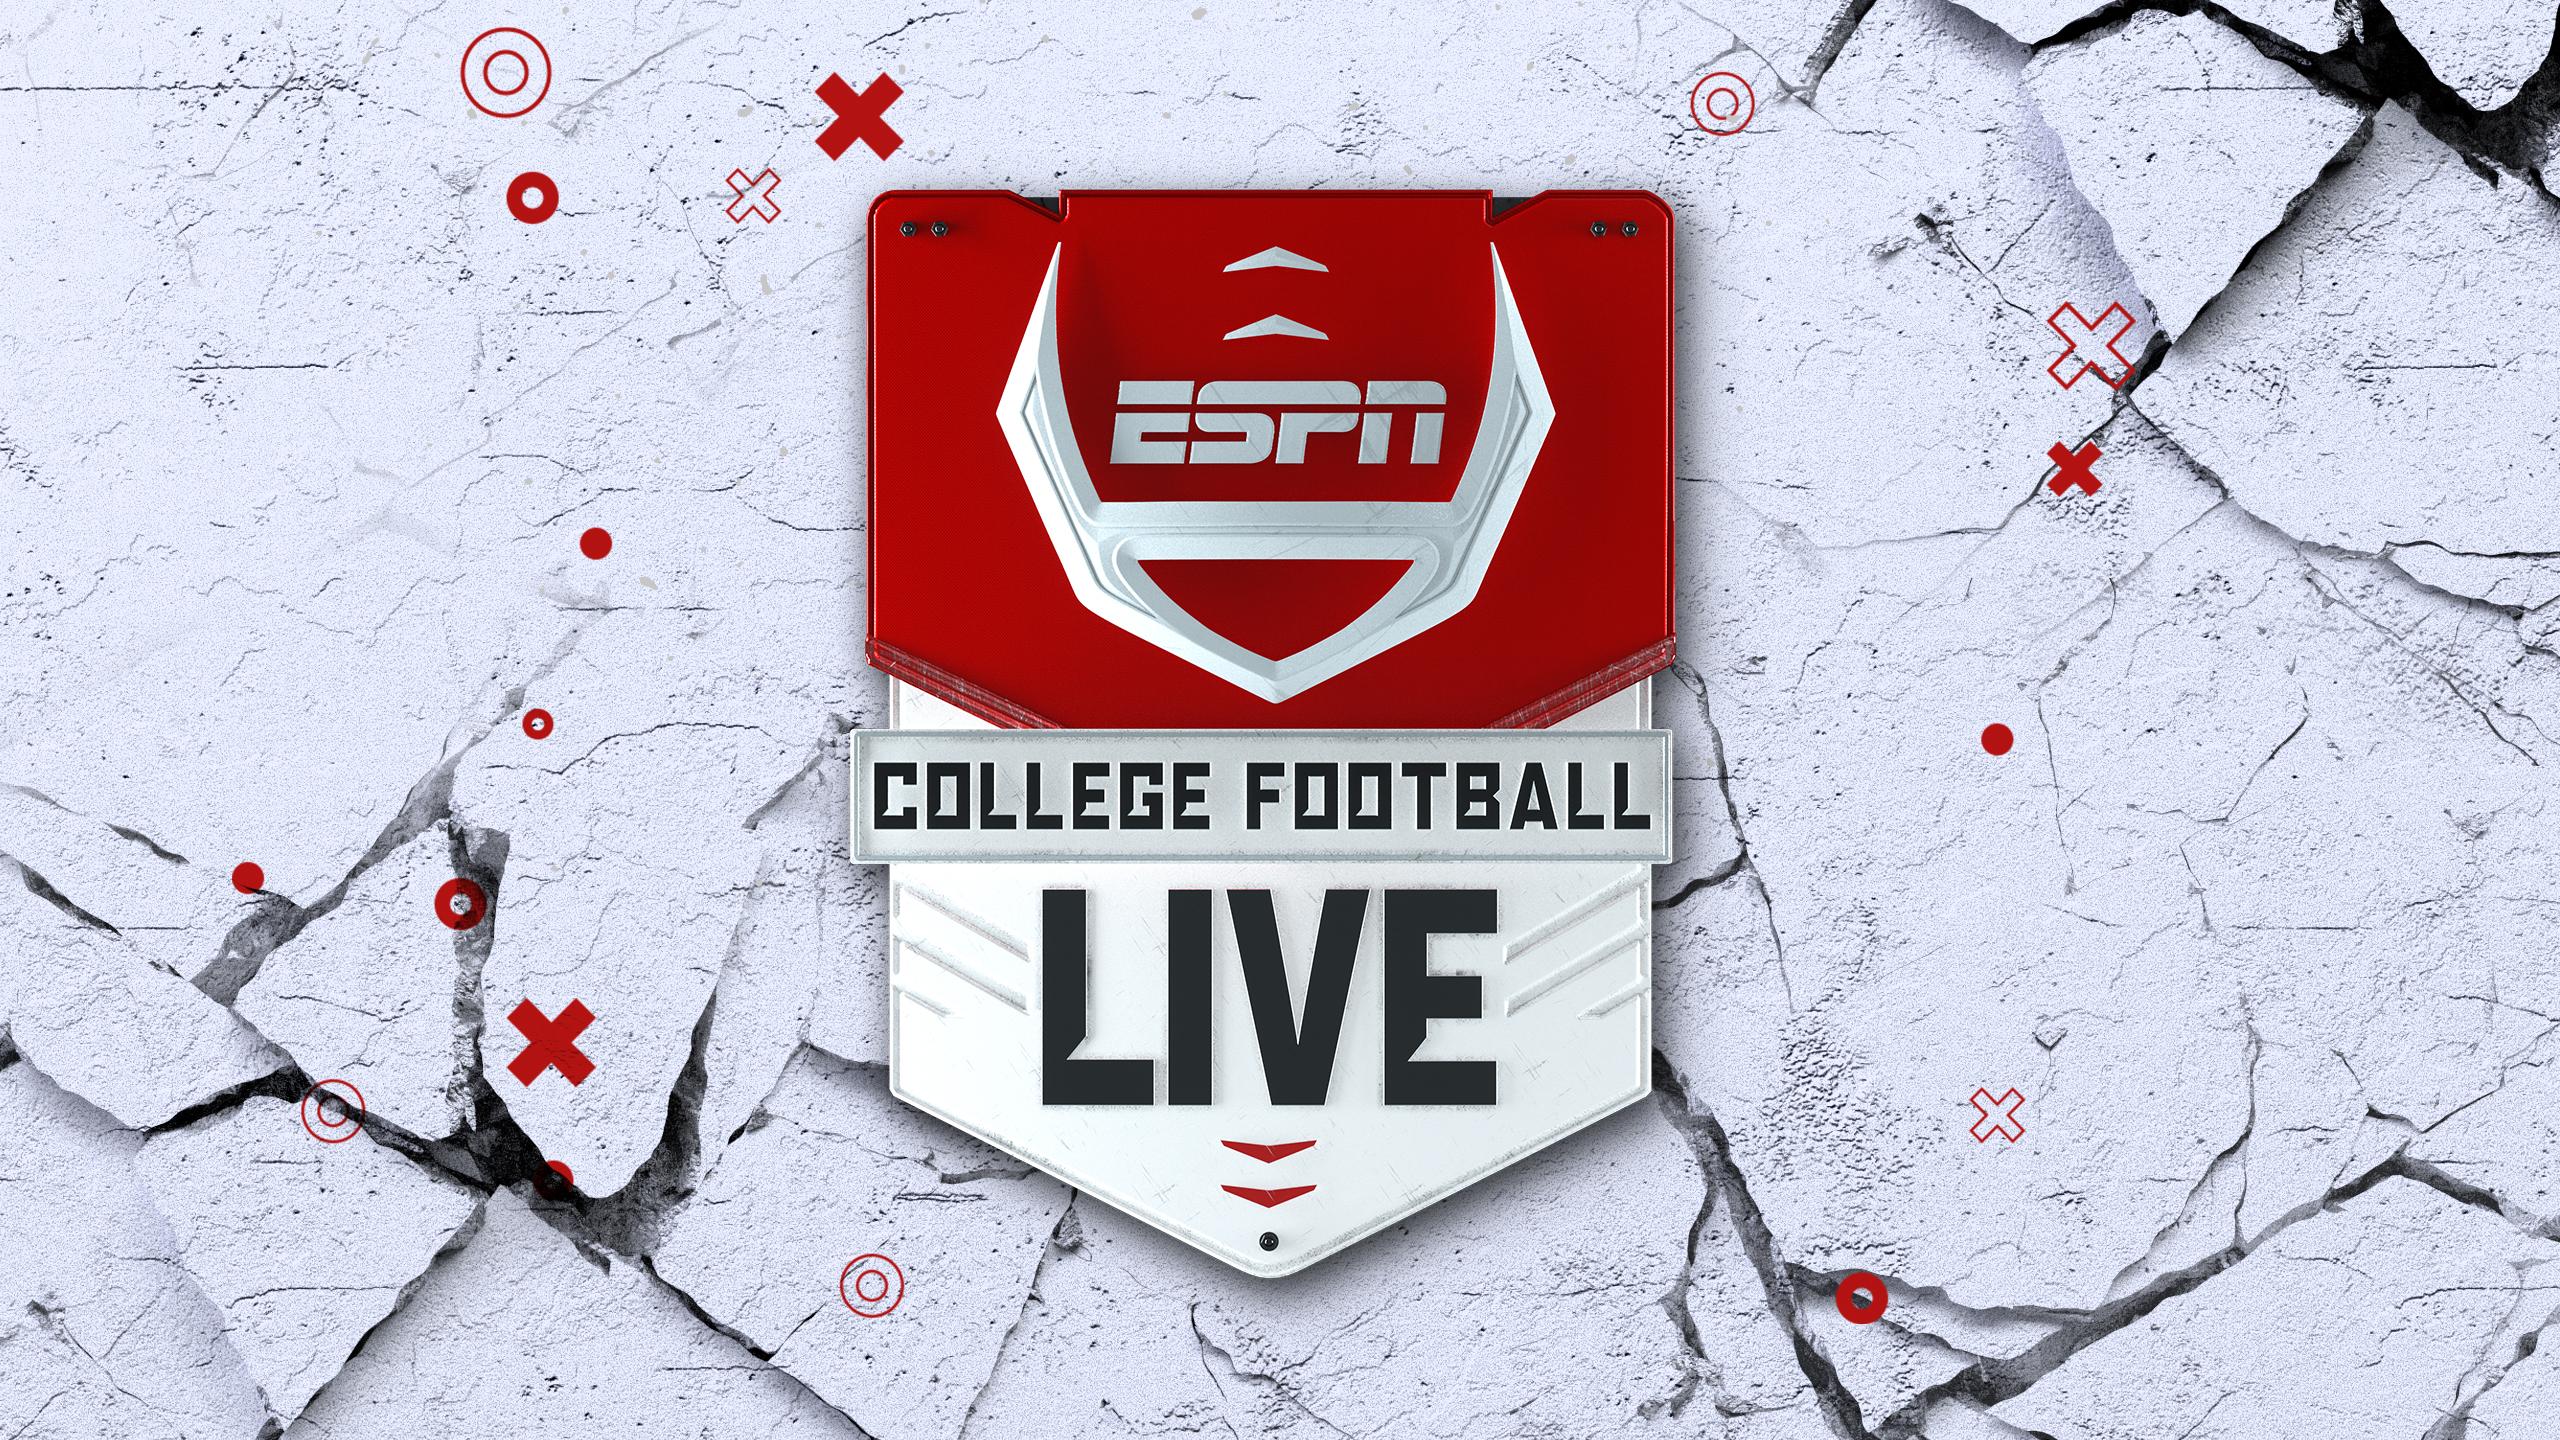 Fri, 12/7 - College Football Live